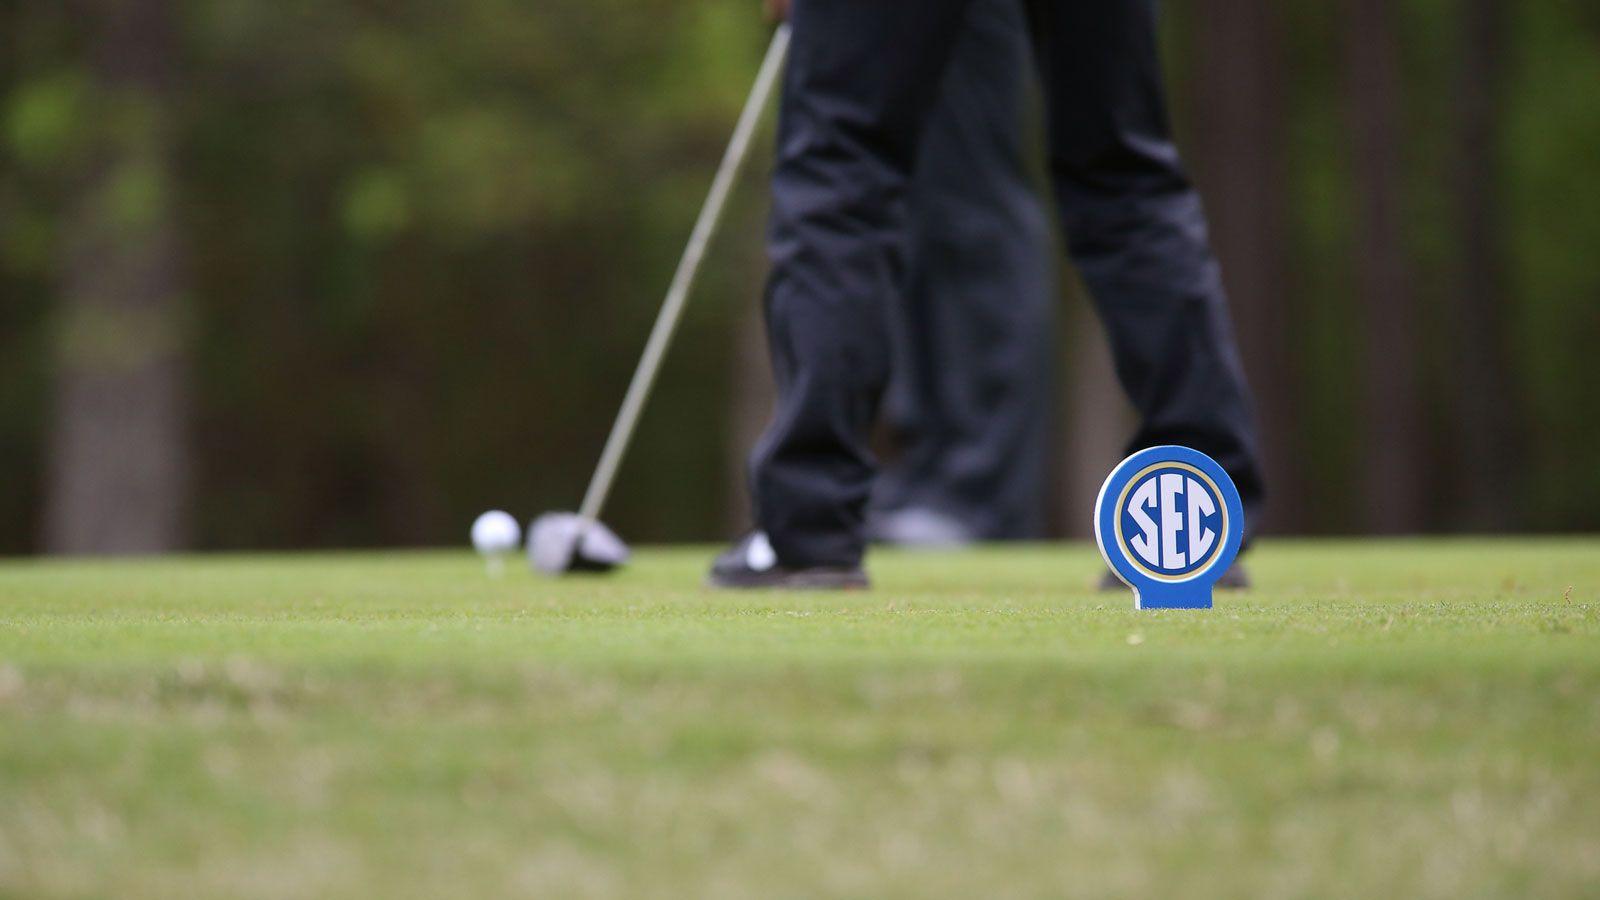 SEC at NCAA Men's Golf Championships